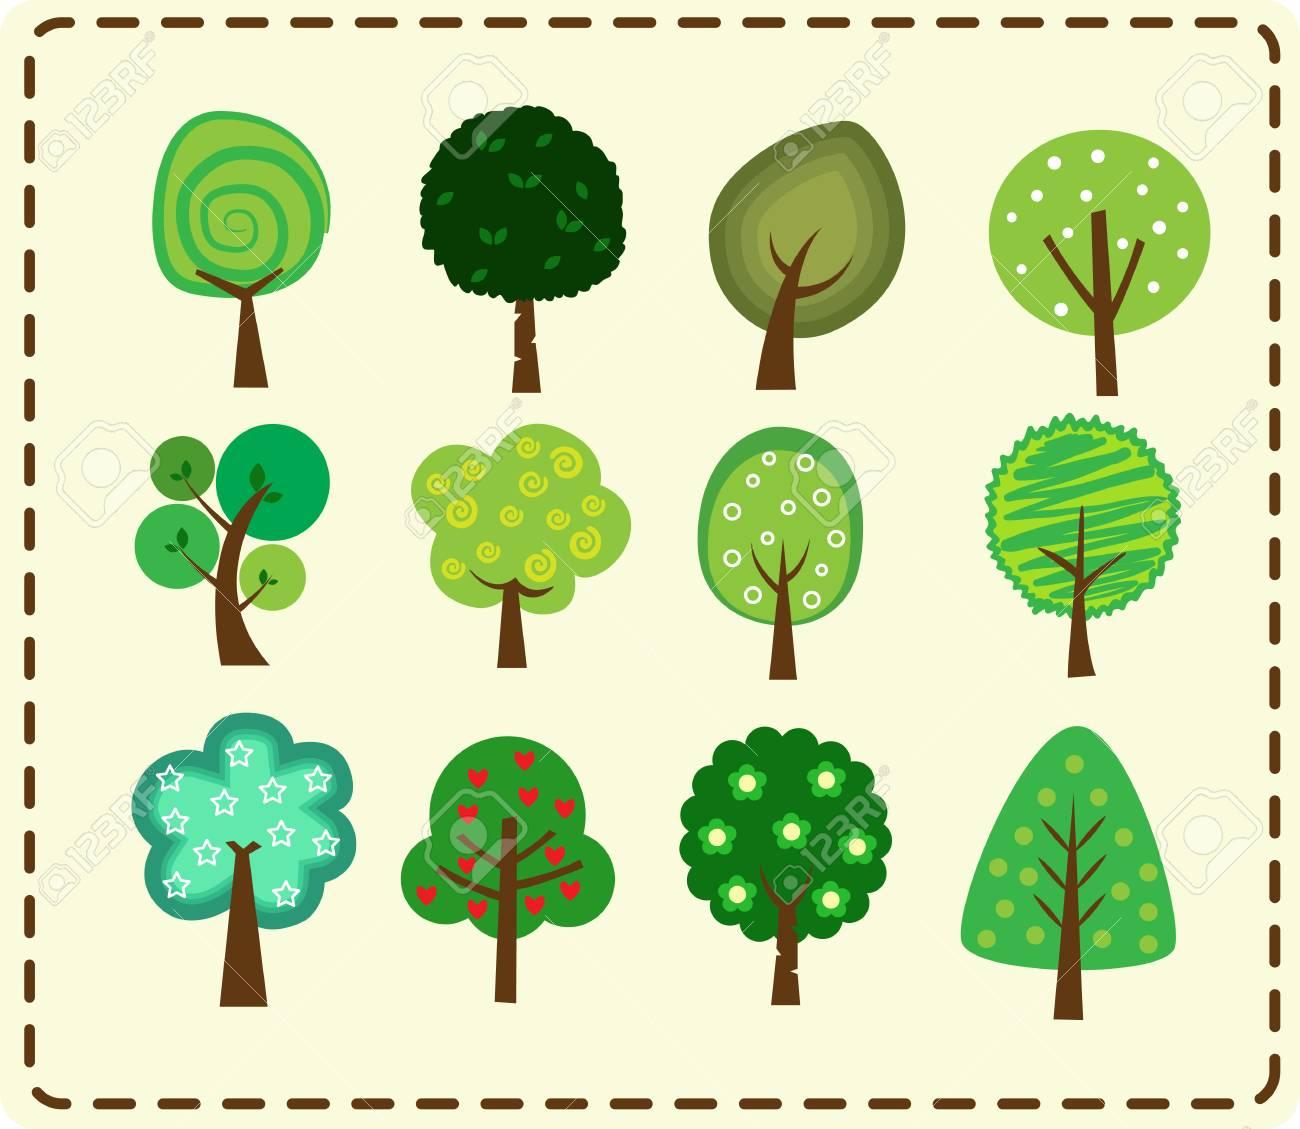 Cute tree icon set - 61790919